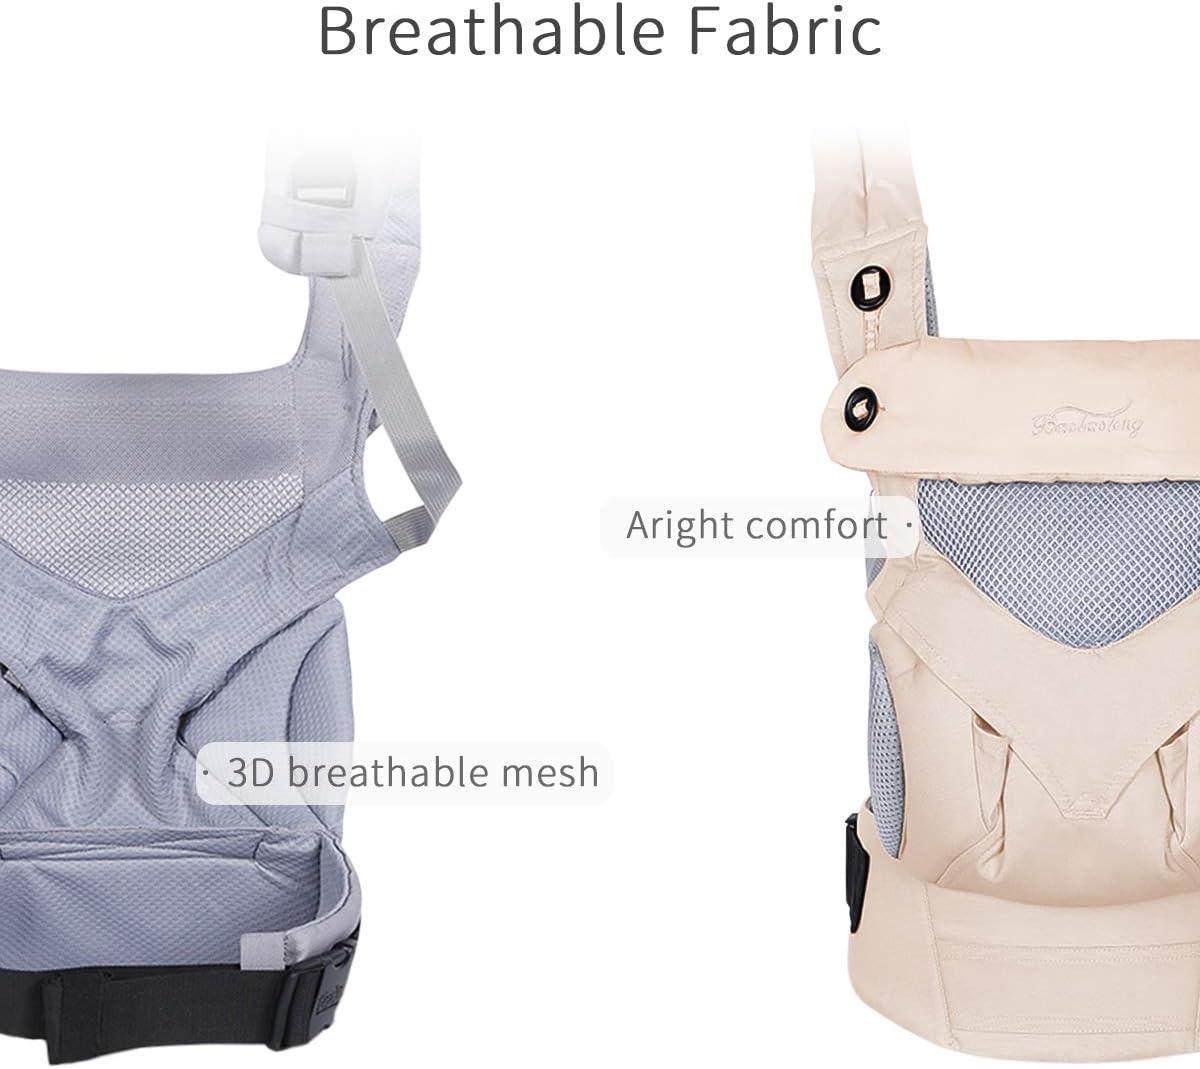 3-48 meses SONARIN 4 en 1 Transpirable Mochila portabeb/é,Malla Transpirable 3D,Capucha de Dormir,para reci/én nacidos y beb/és carga m/áxima 20 kg,M/últiples posiciones,Marsupio portabeb/é Azul